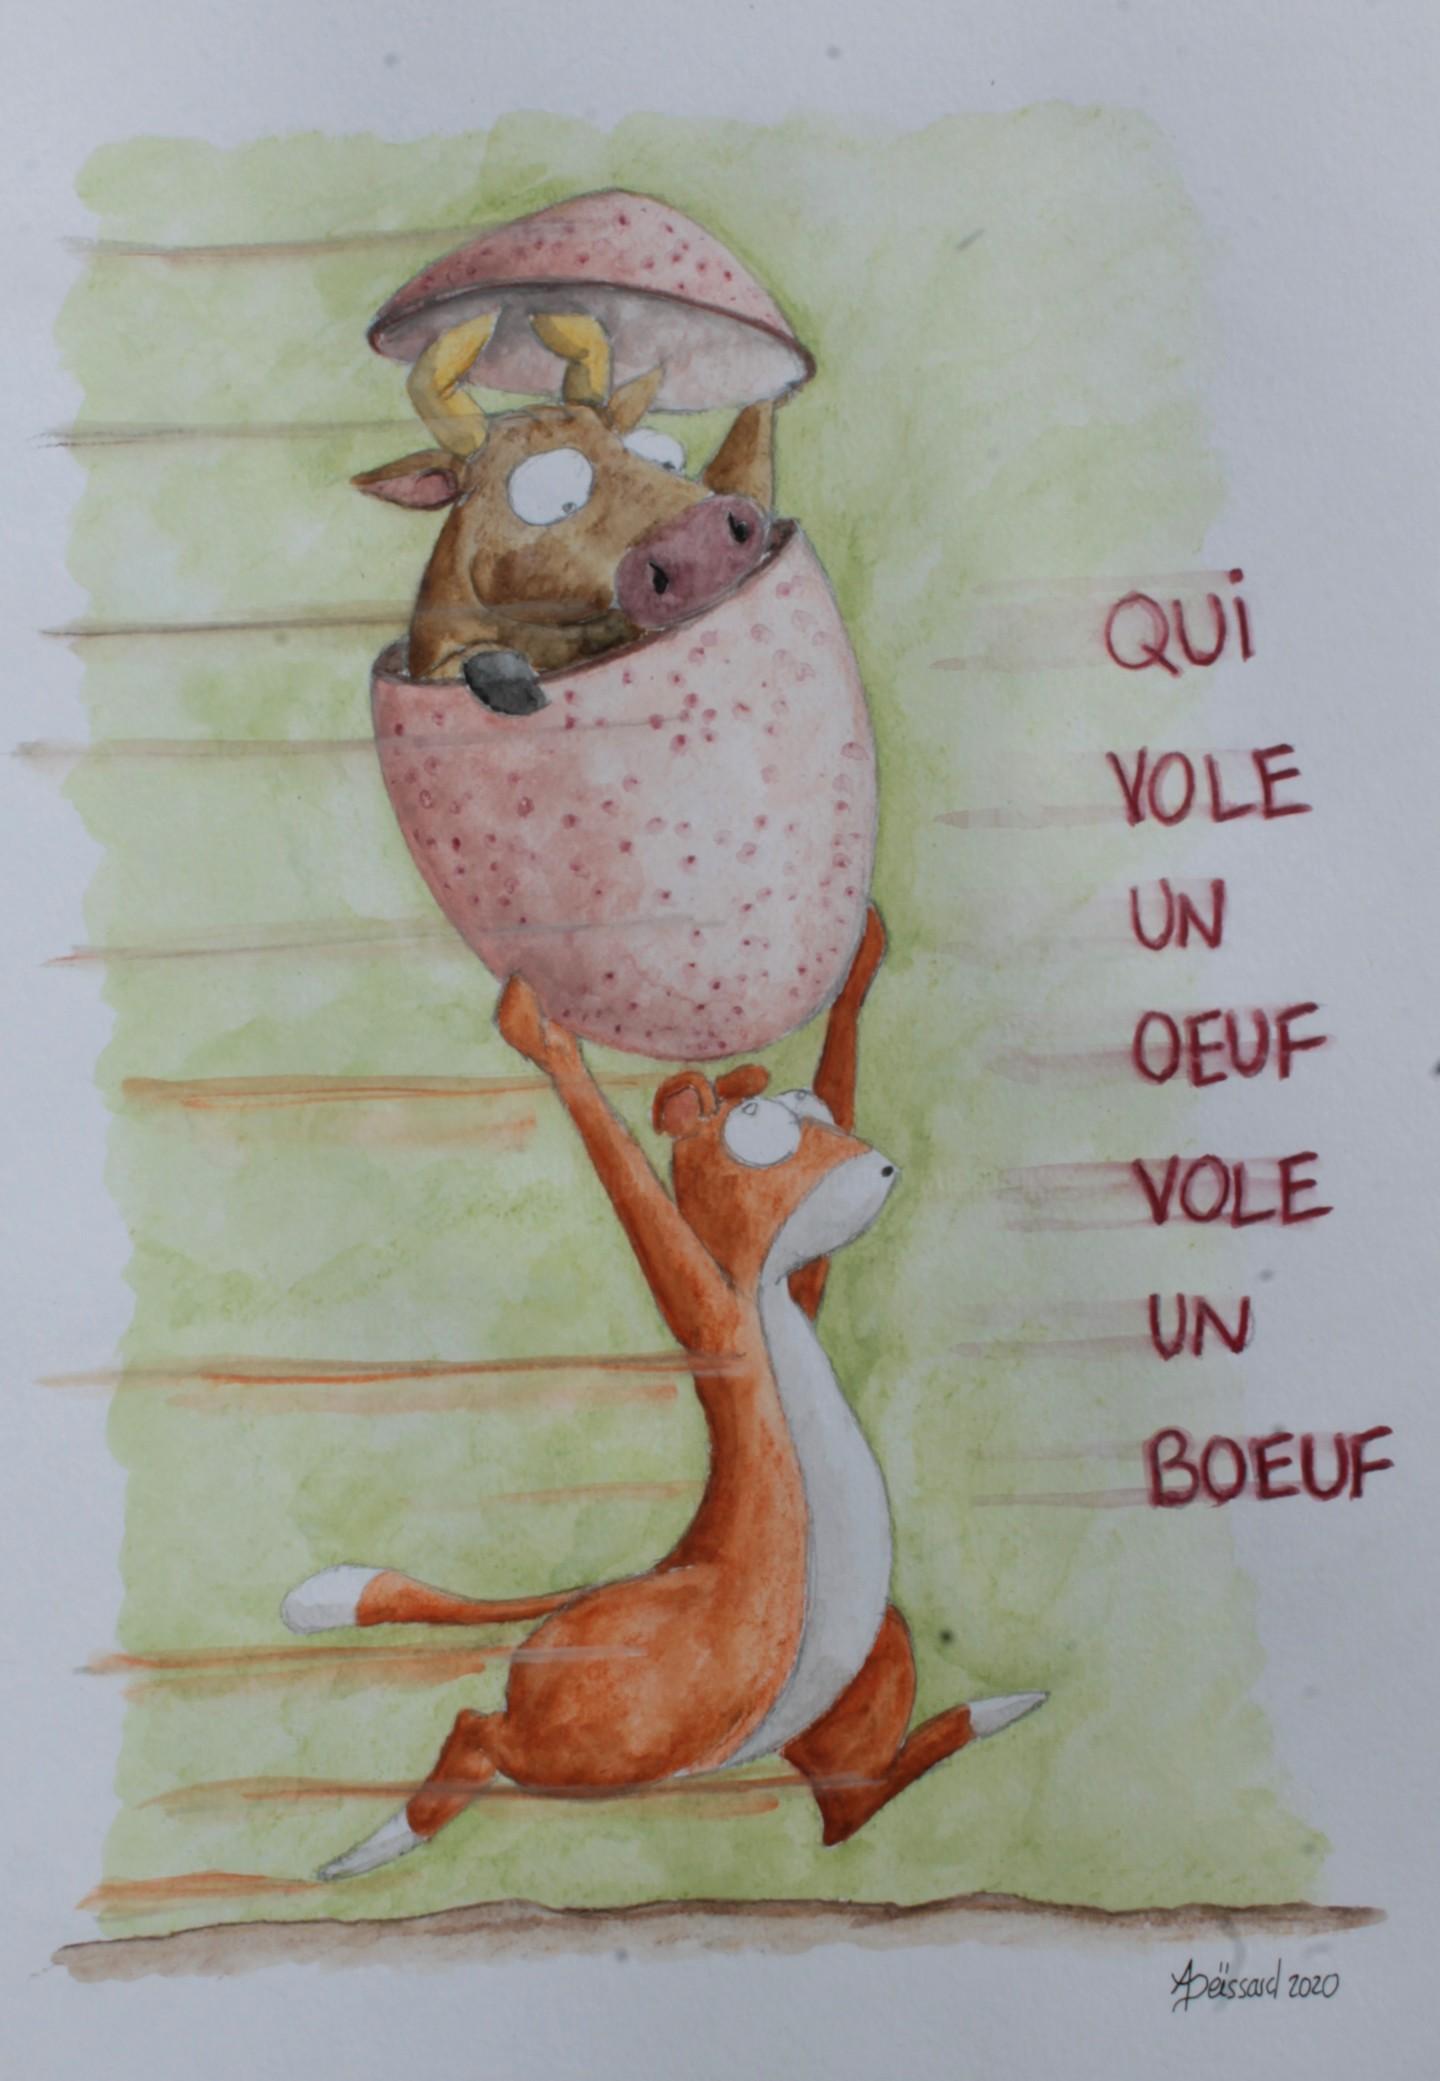 Qui Vole Un Oeuf Vole Un Boeuf : boeuf, Boeuf, Drawing, Monde, Mieux, Artmajeur